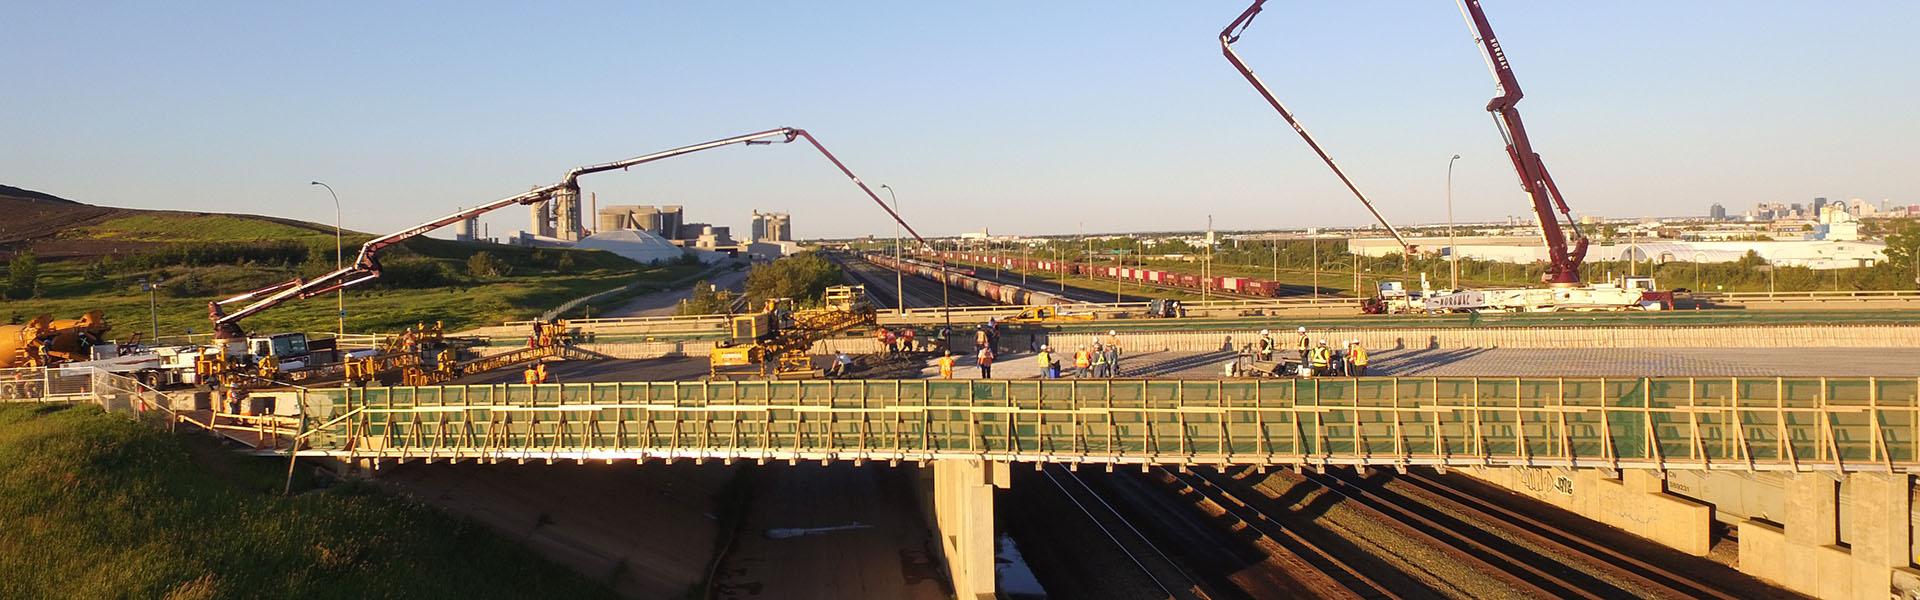 170th_Street_Railyard_banner